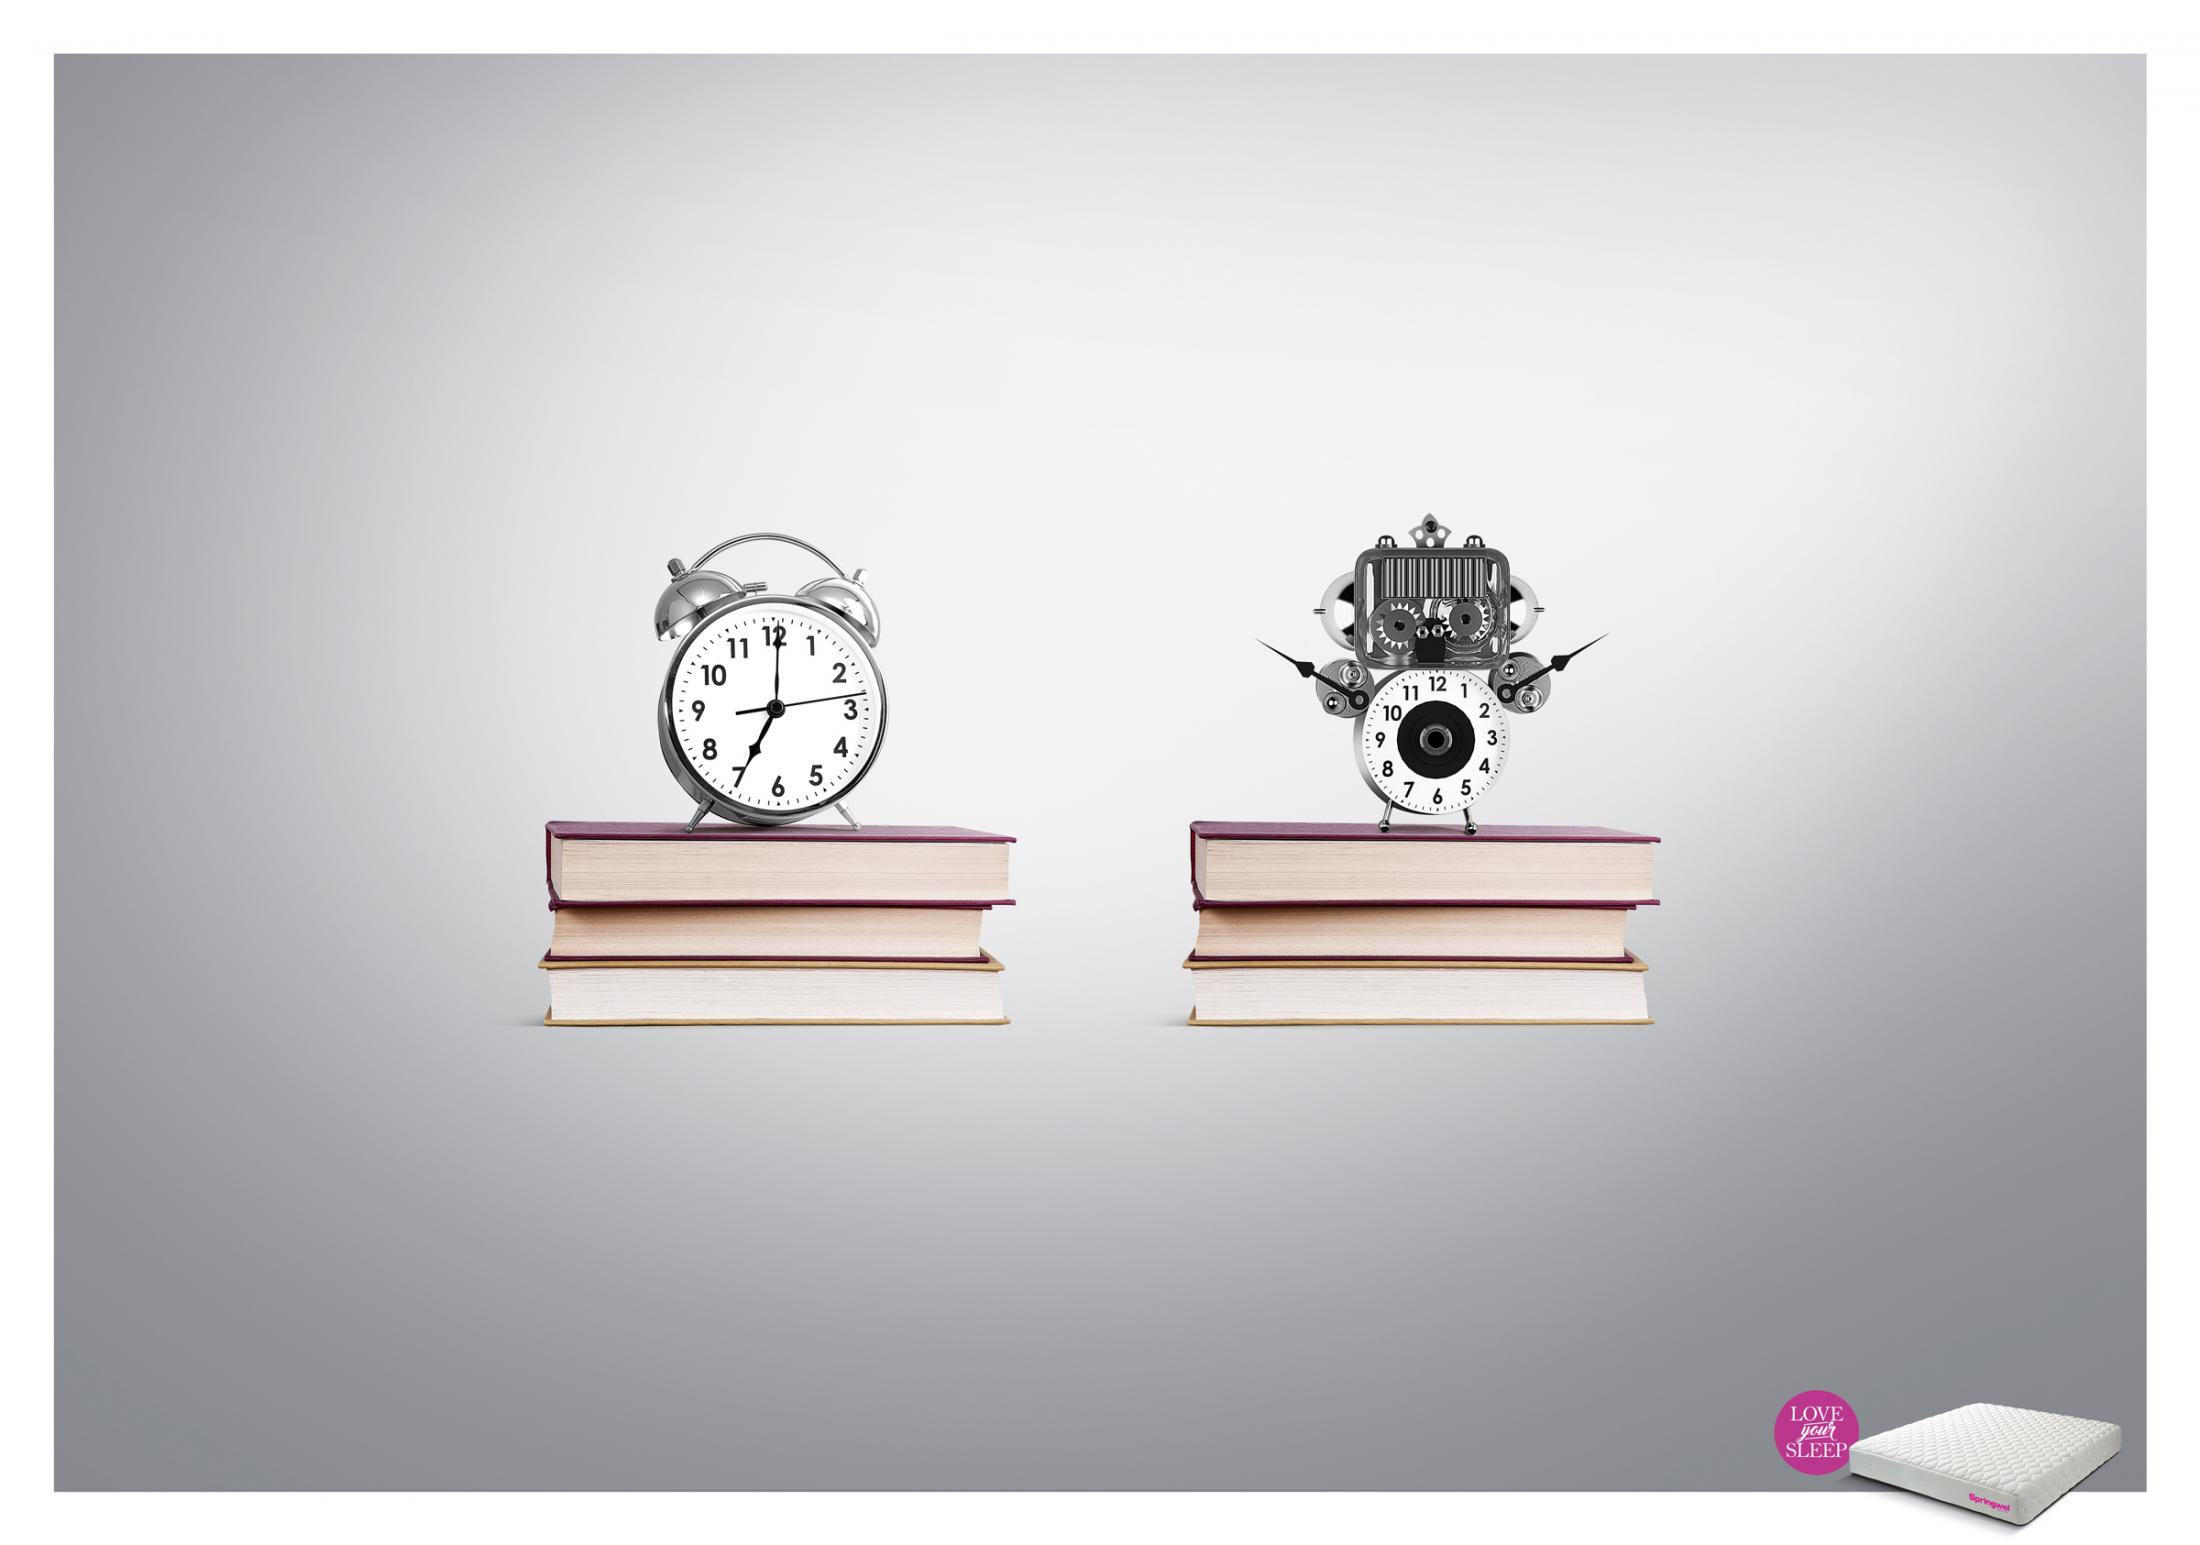 Springwel Print Ad - Love your Sleep - Alarm Clock